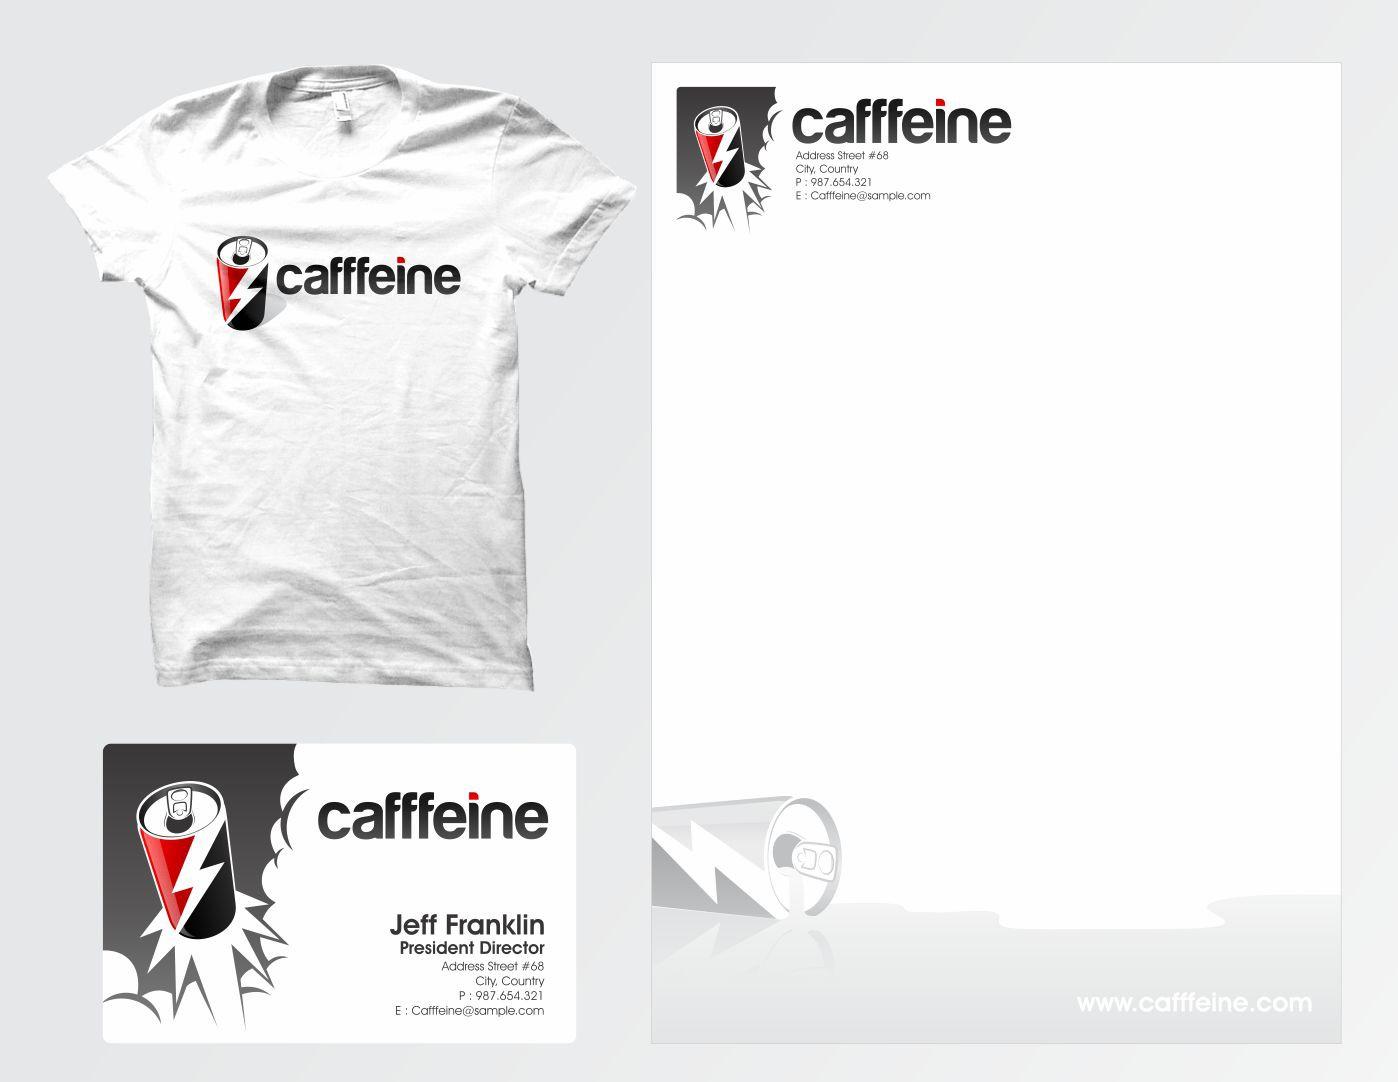 Help Cafffeine with a new logo